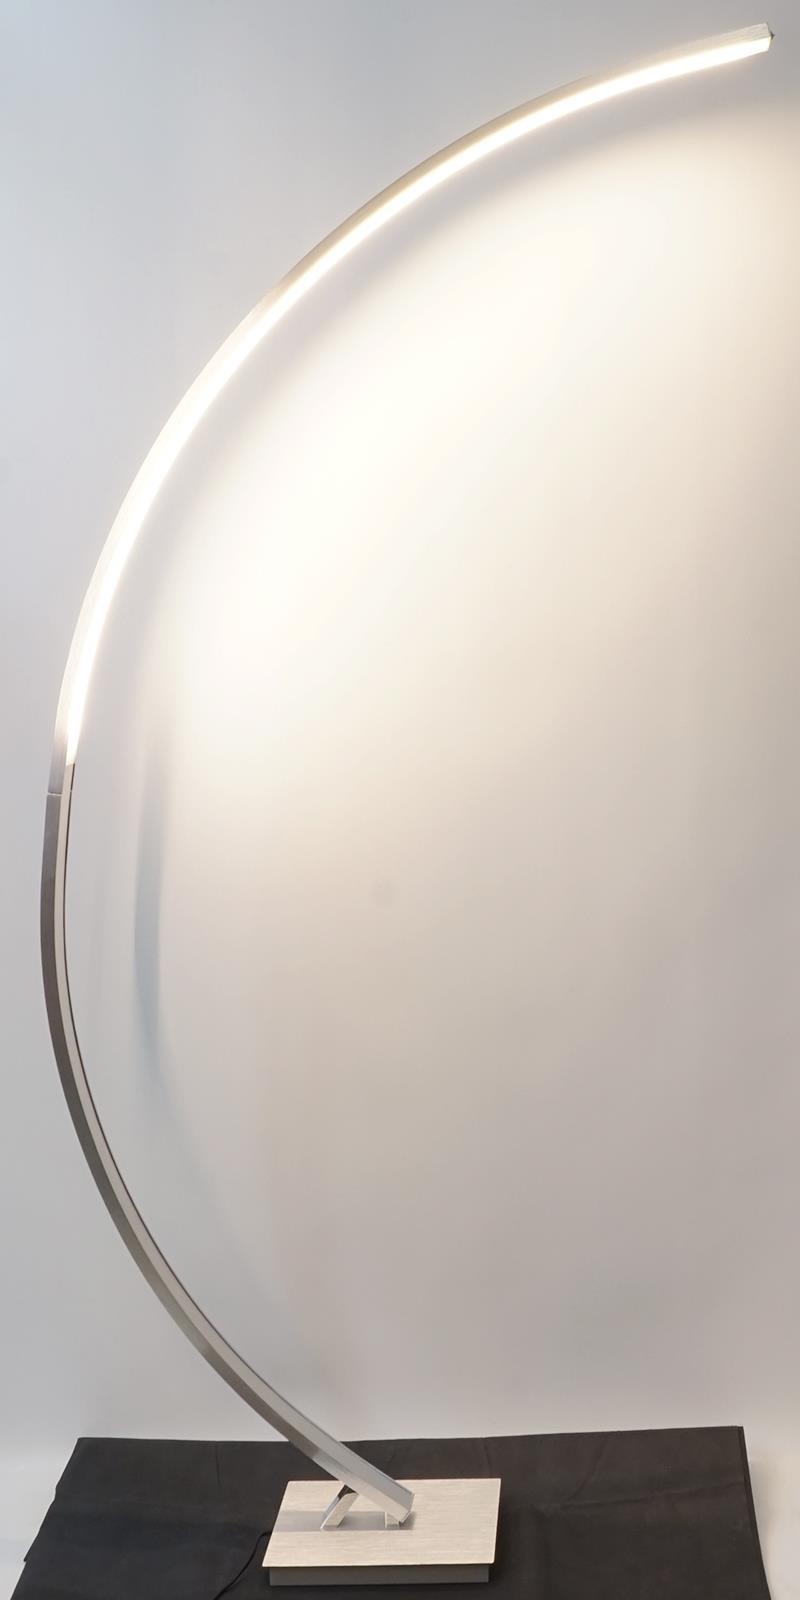 bogenleuchte led dimmbar ean770 livarno lux stehlampe standleuchte b ware eur 32 50 picclick de. Black Bedroom Furniture Sets. Home Design Ideas